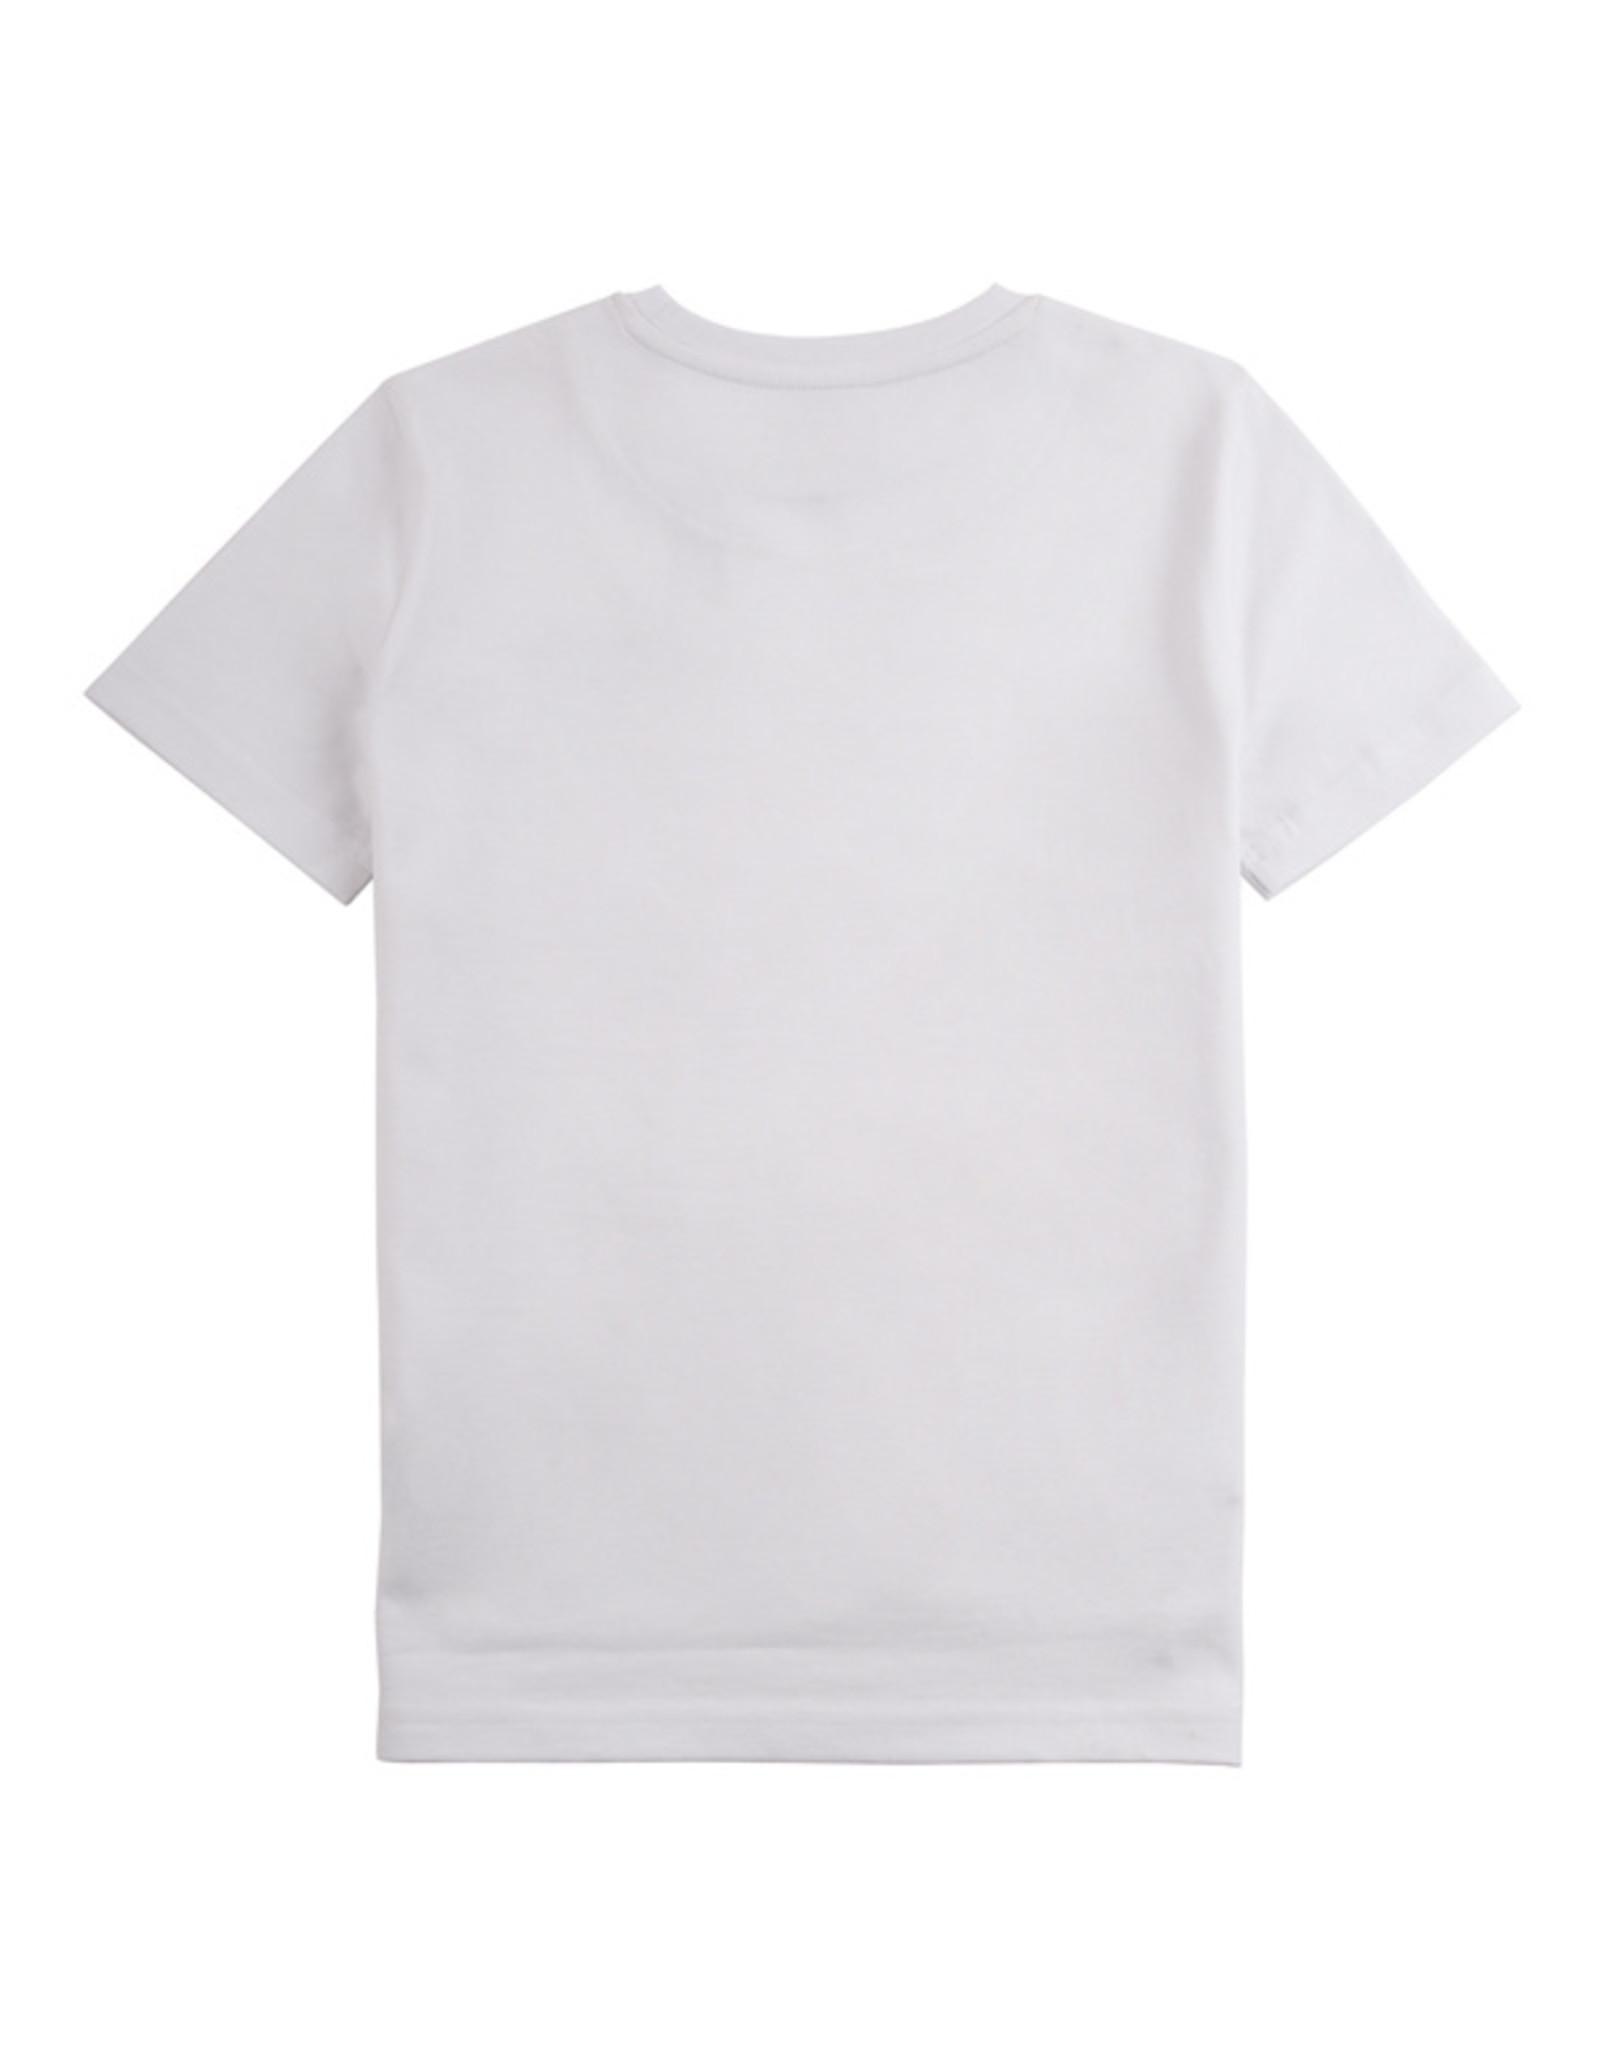 Lyle & Scott Boys Reflective Detail T Shirt Bright White